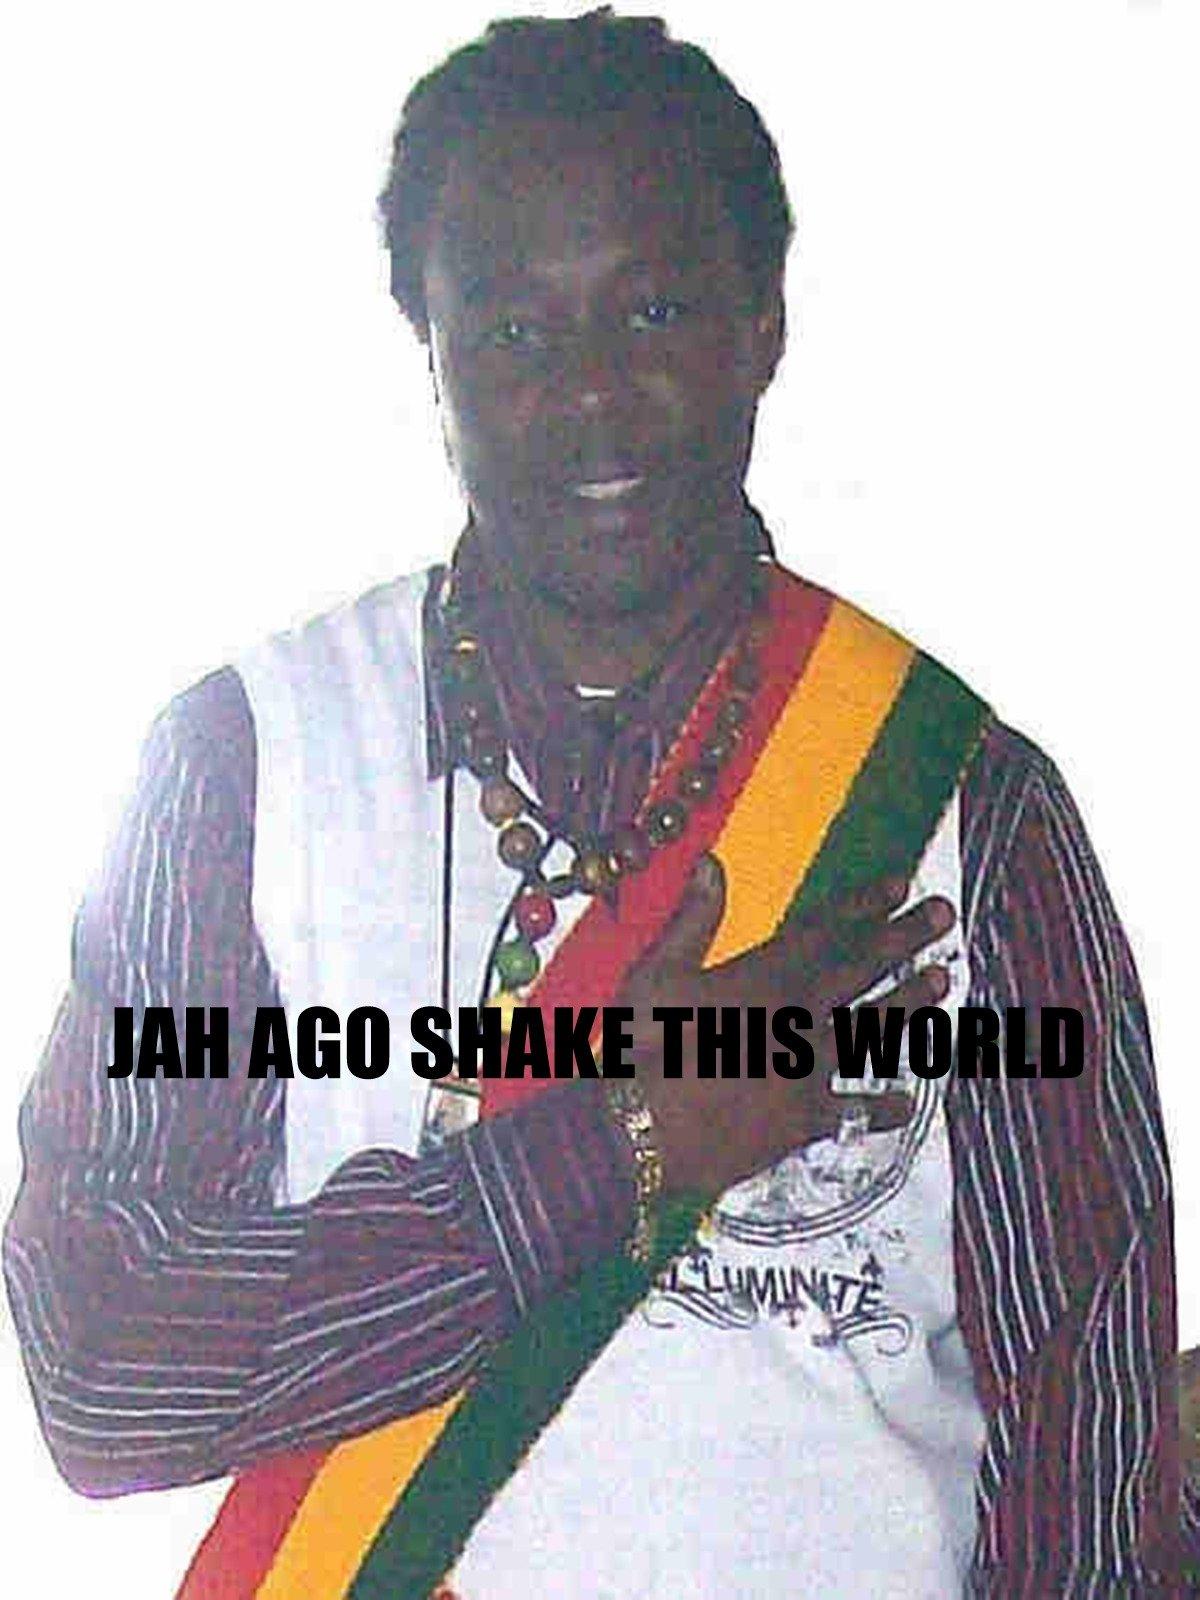 Jah Ago Shake This World (Music Video)